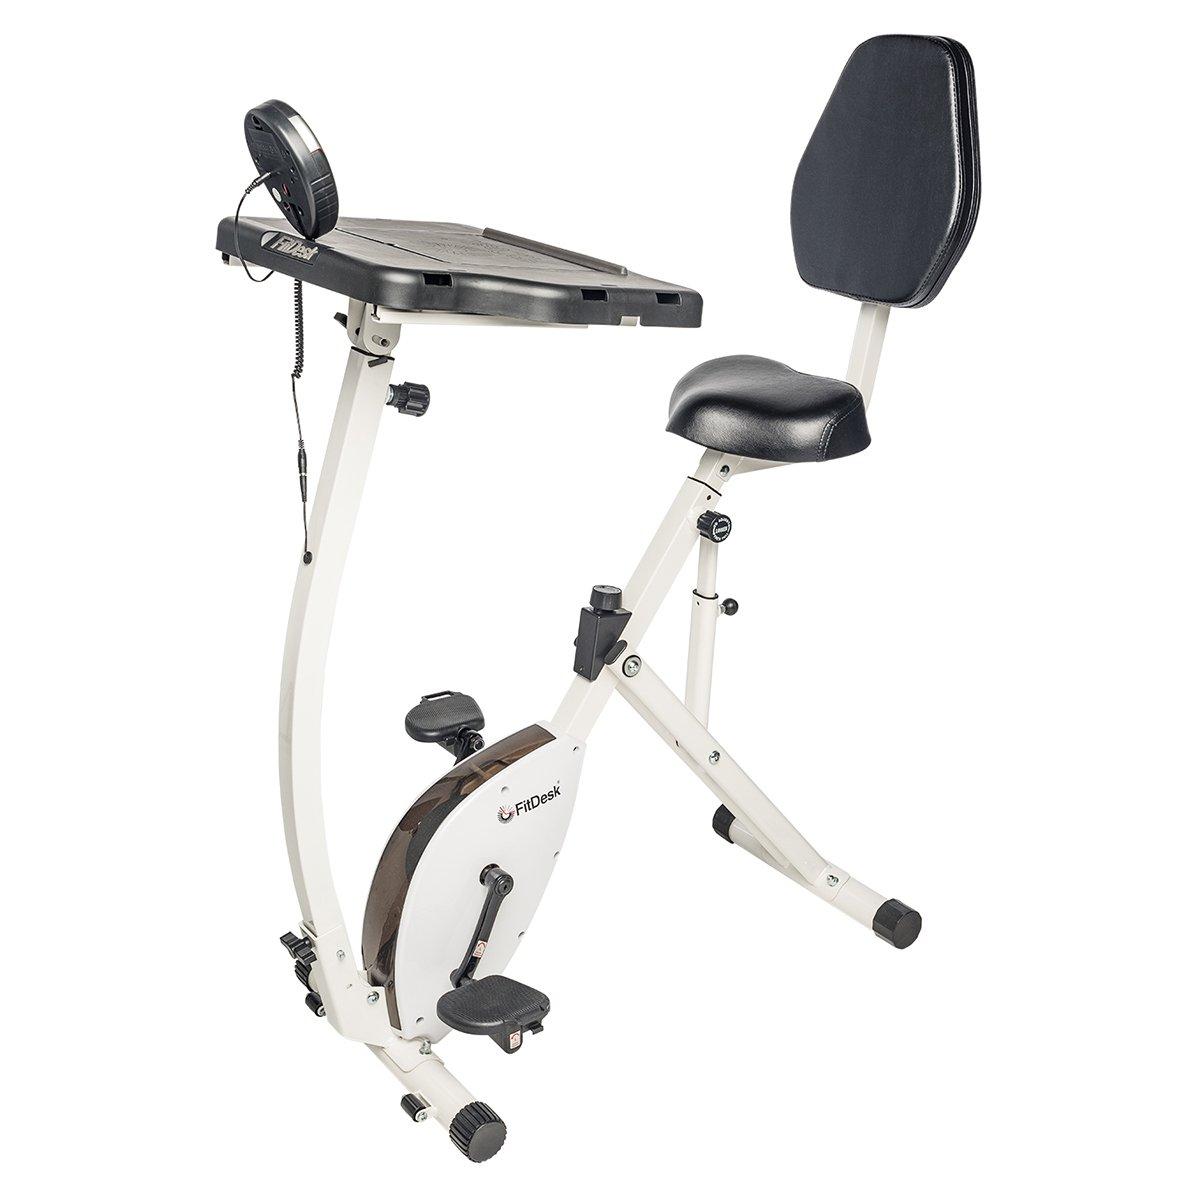 02b1830e952 Get Quotations · FitDesk Exercise Bike Recumbent Exercise Bike with Sliding  Desk